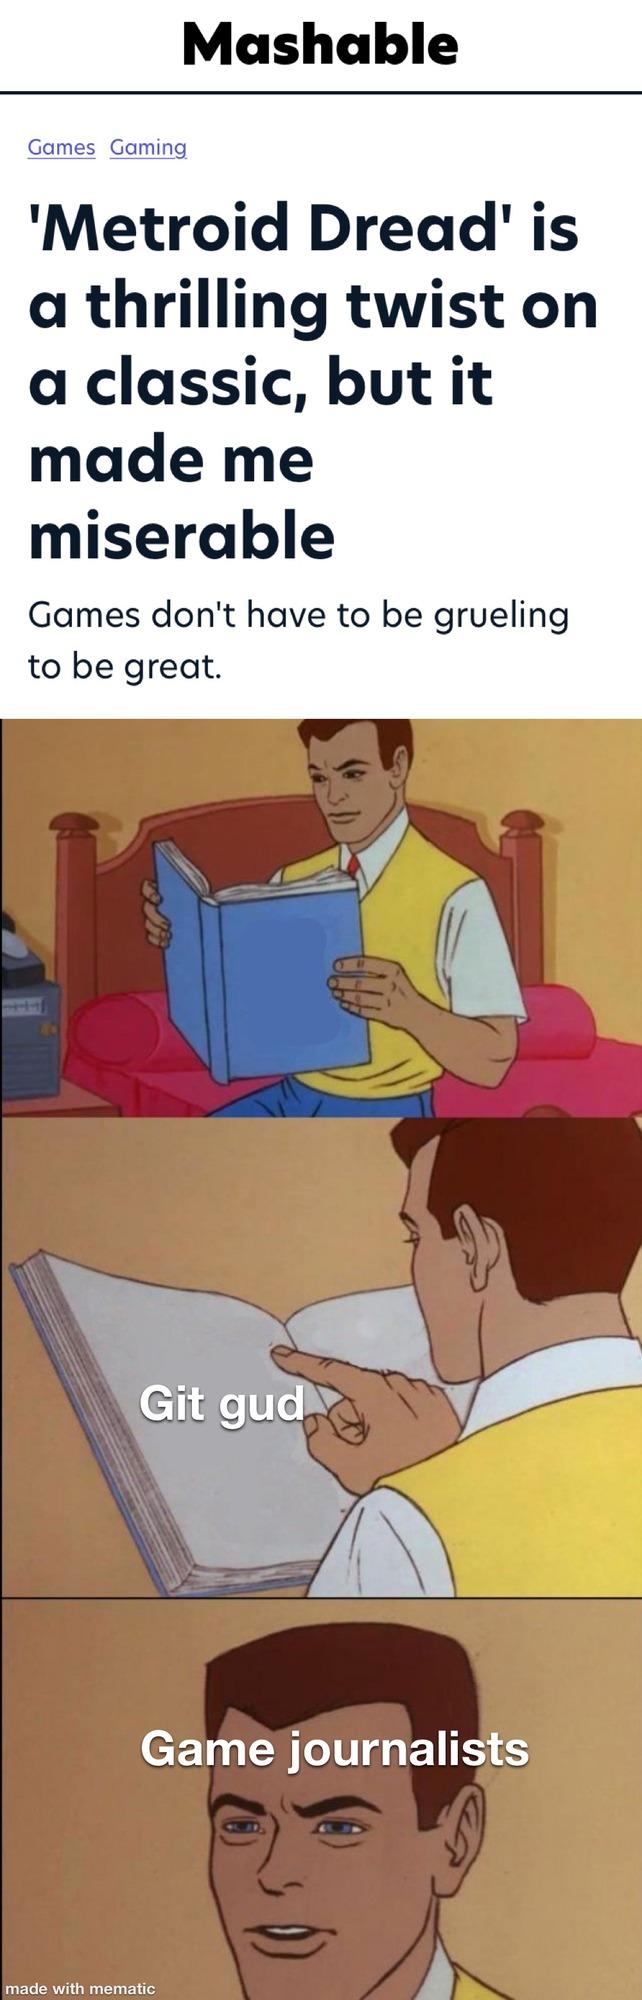 Metroid dread is amazing so far - meme